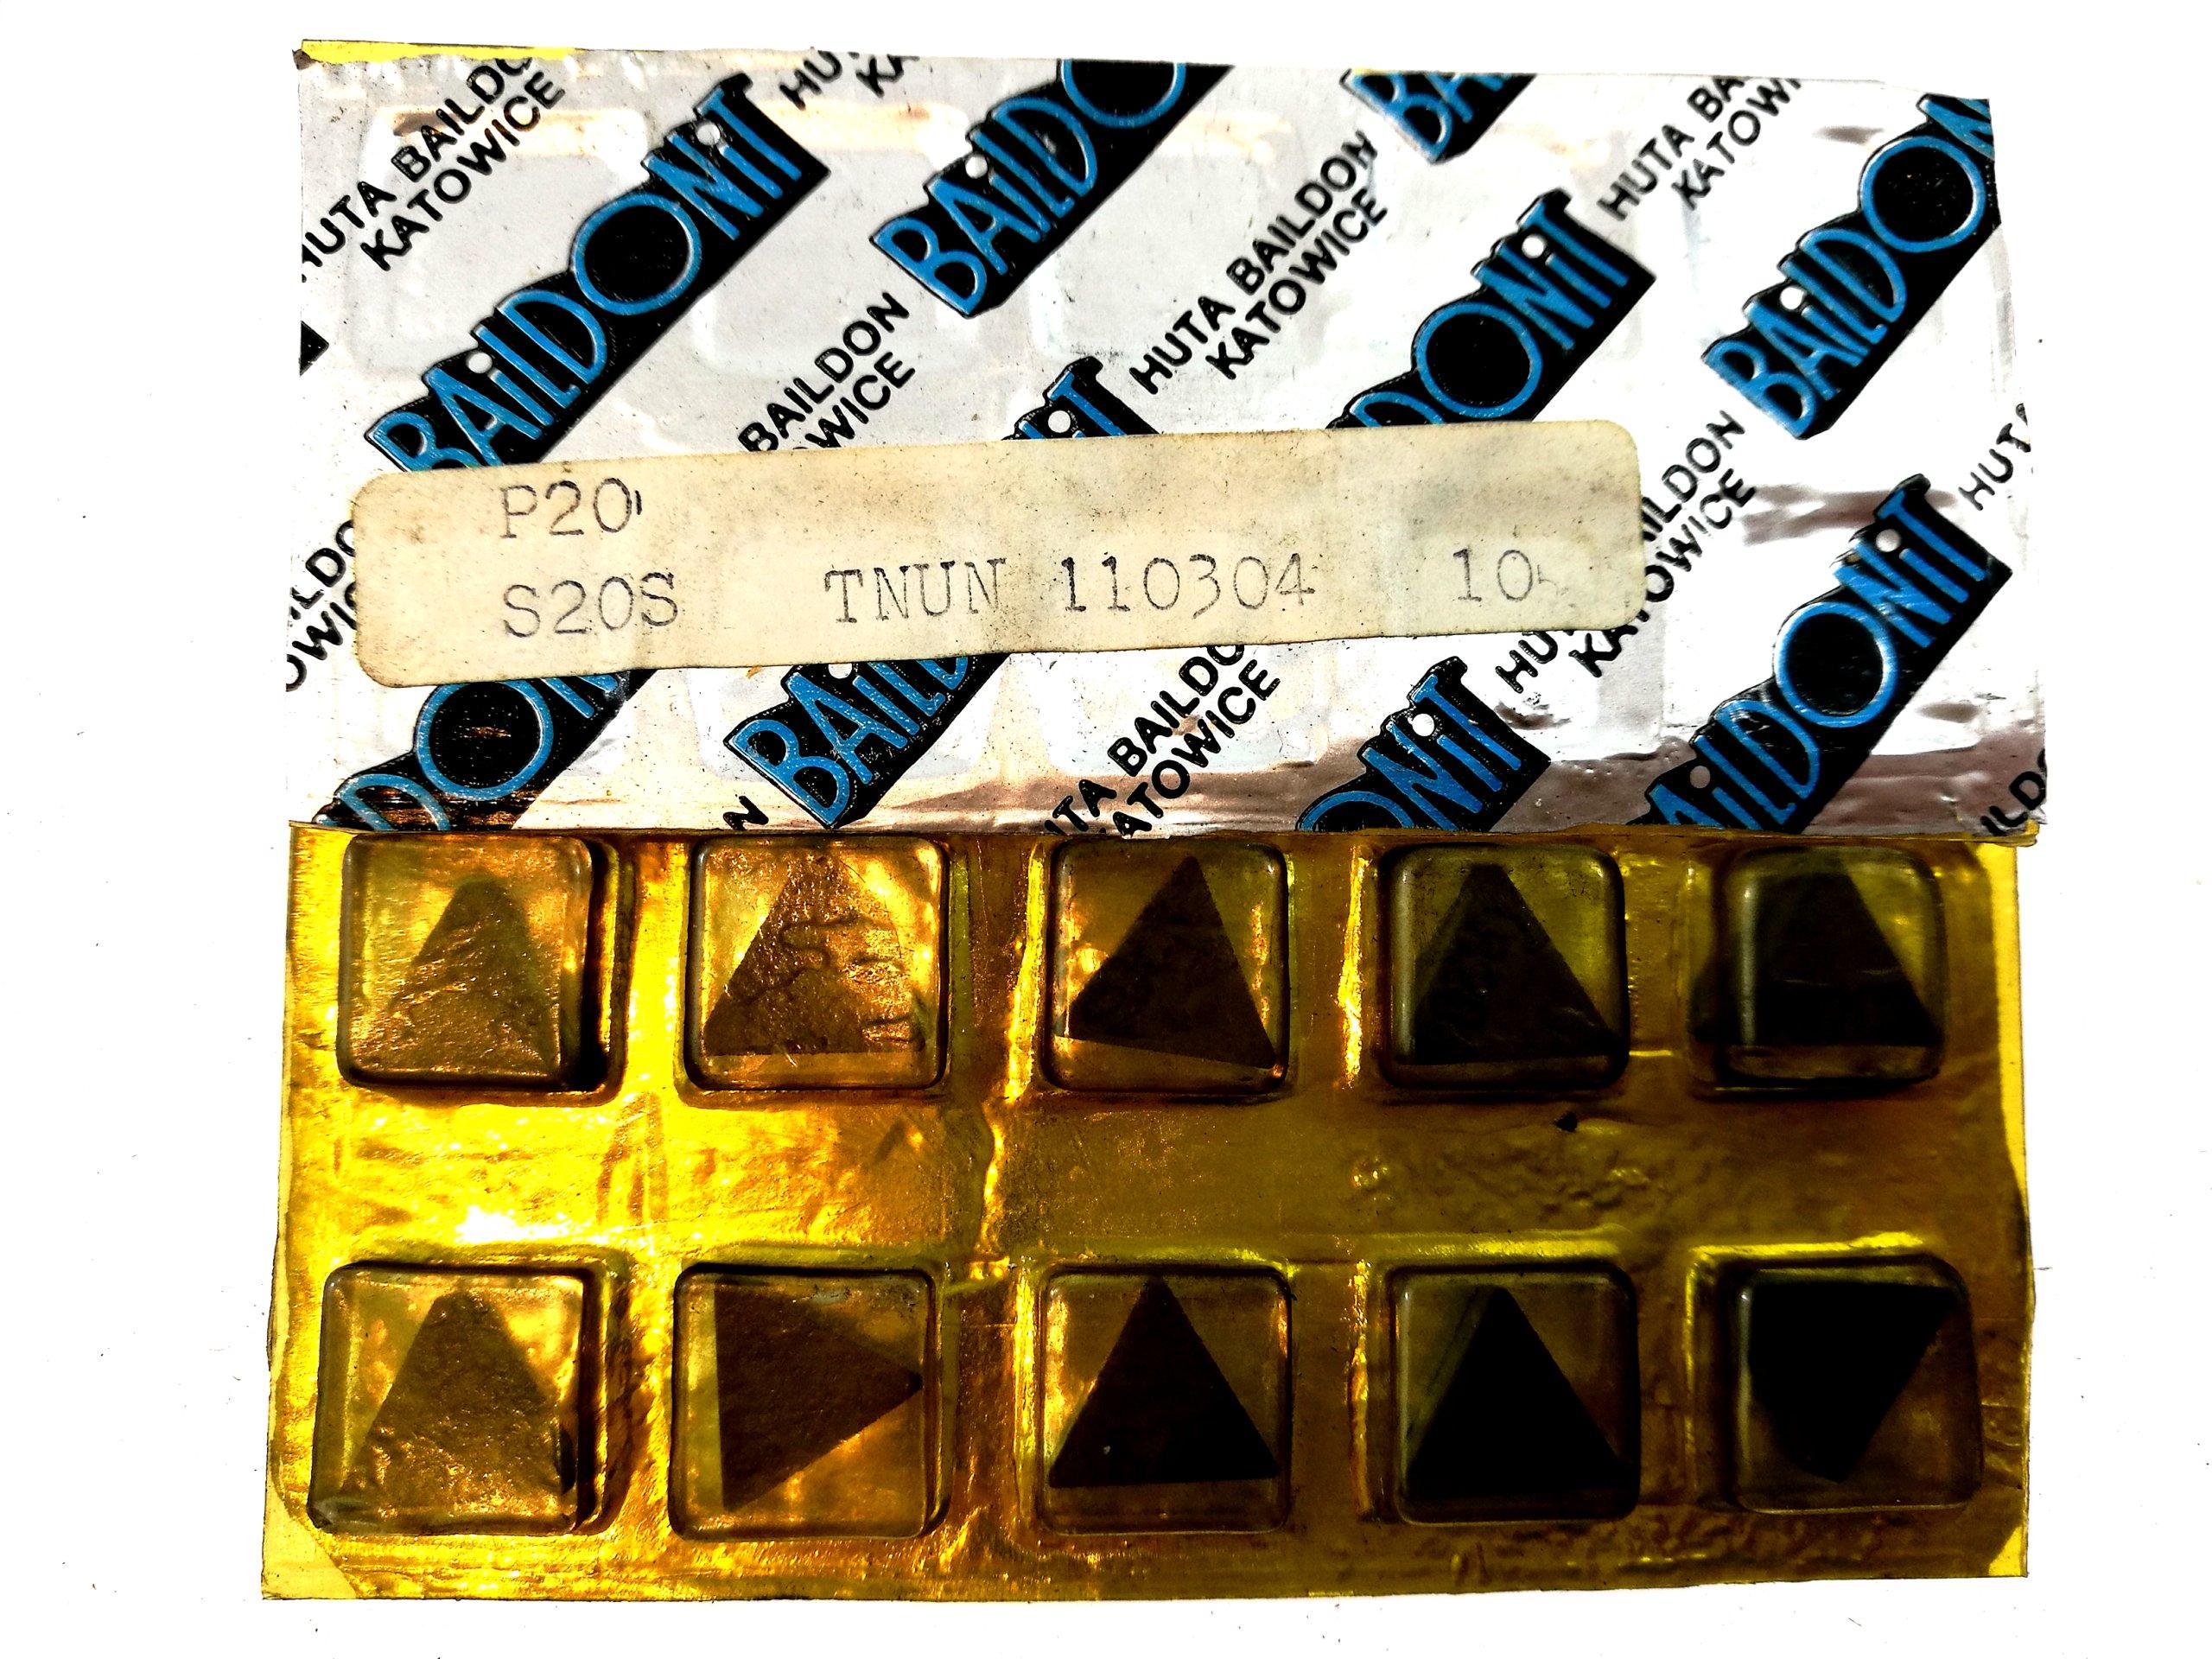 TNUN Tabuľka 110304 S20S pre oceľ 11 03 04